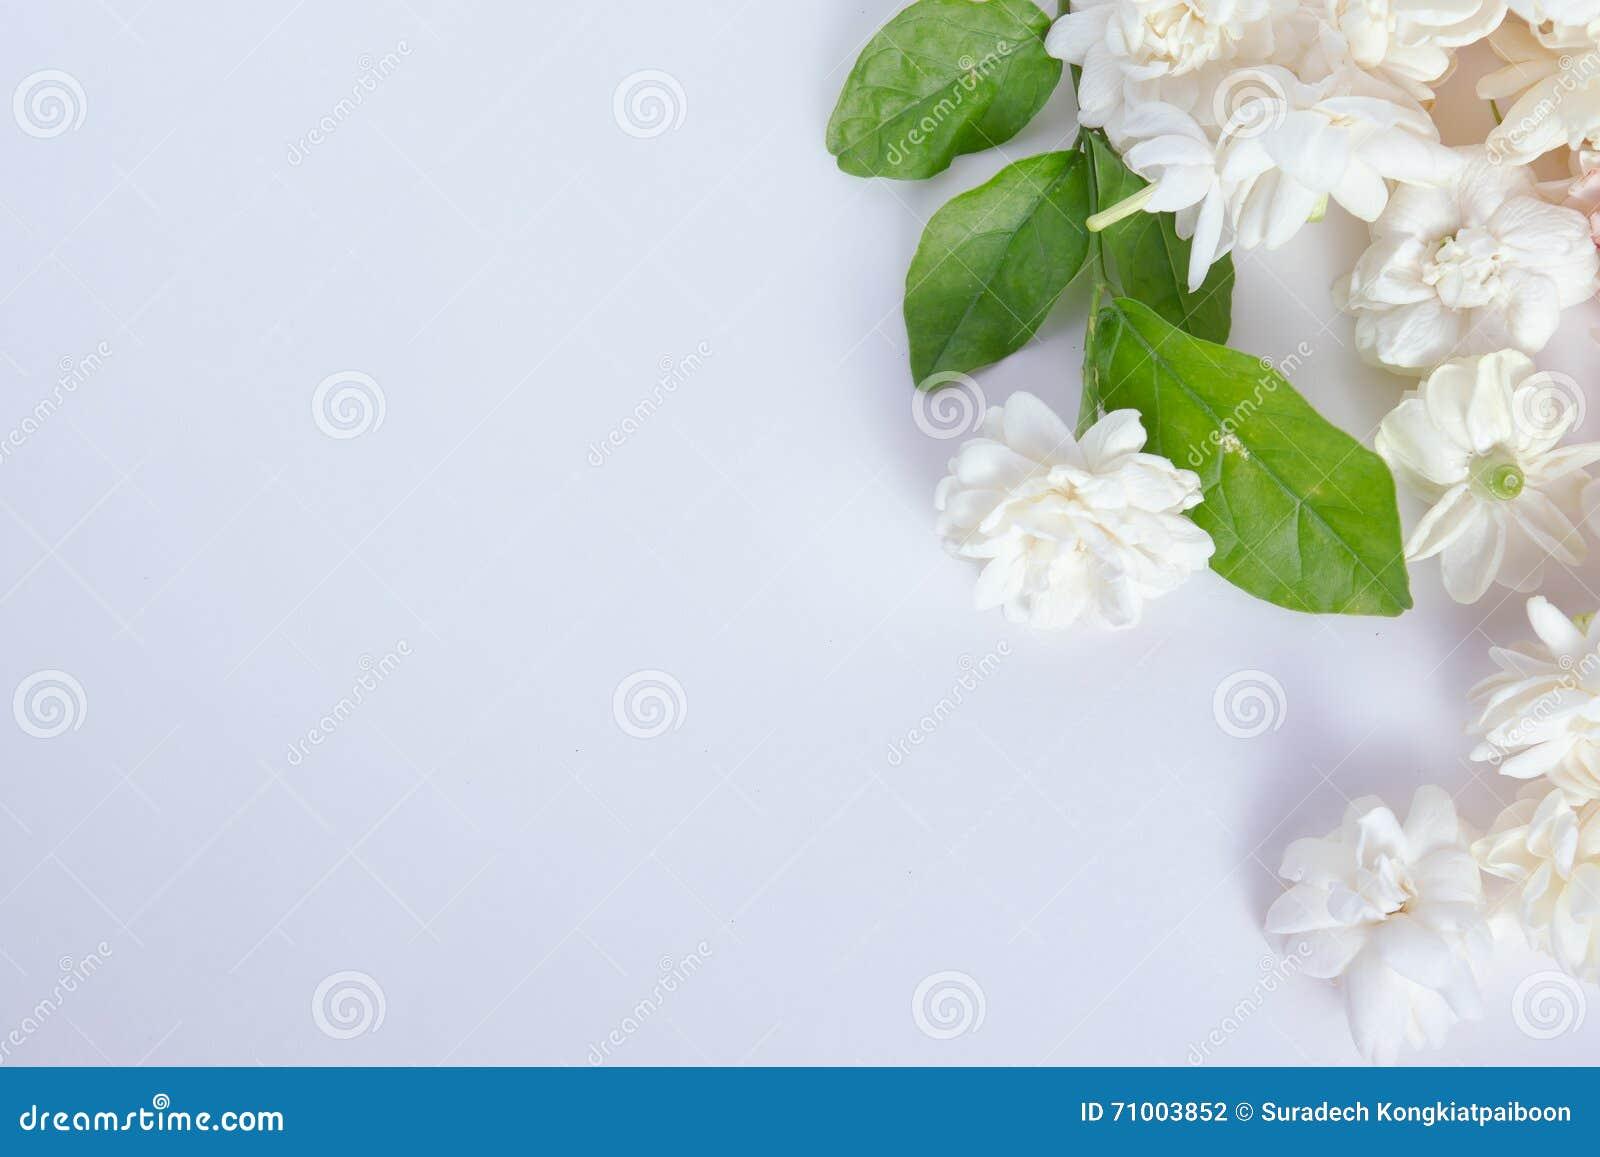 Jasmine flowers on white background stock photo image of green jasmine flowers on white background izmirmasajfo Gallery